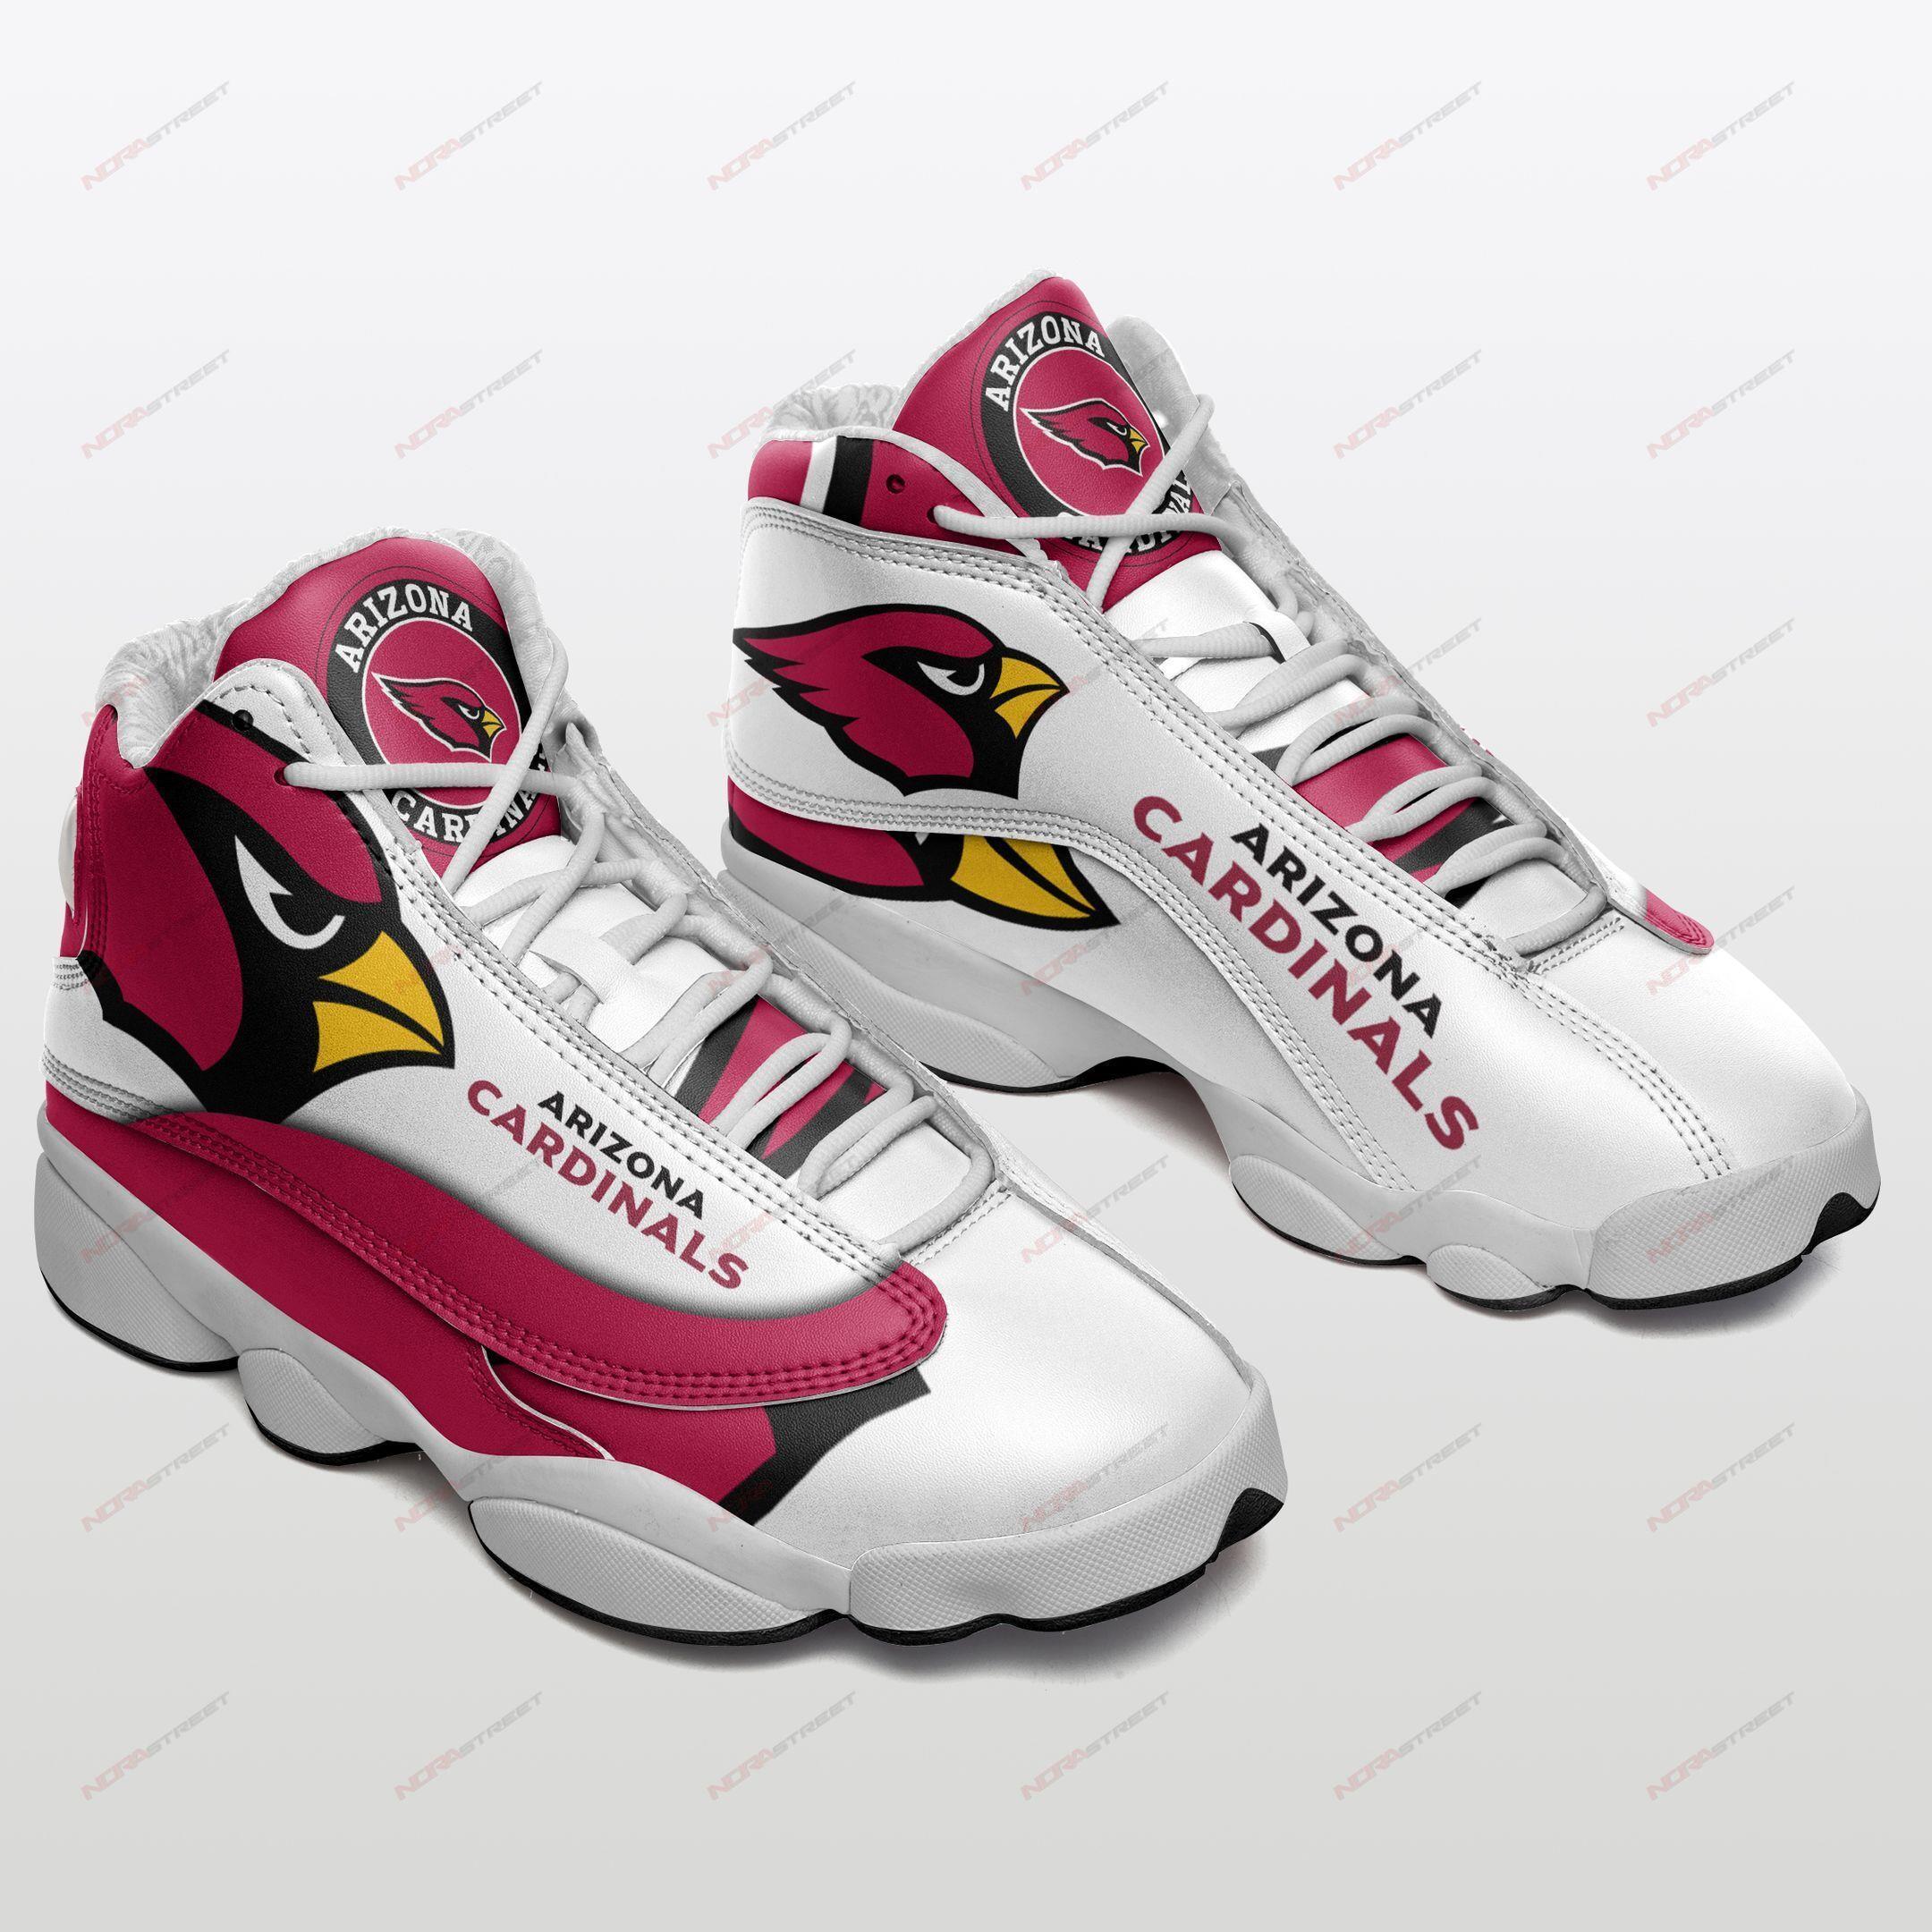 Arizona Cardinals Air Jordan 13 Sneakers Sport Shoes Full Size